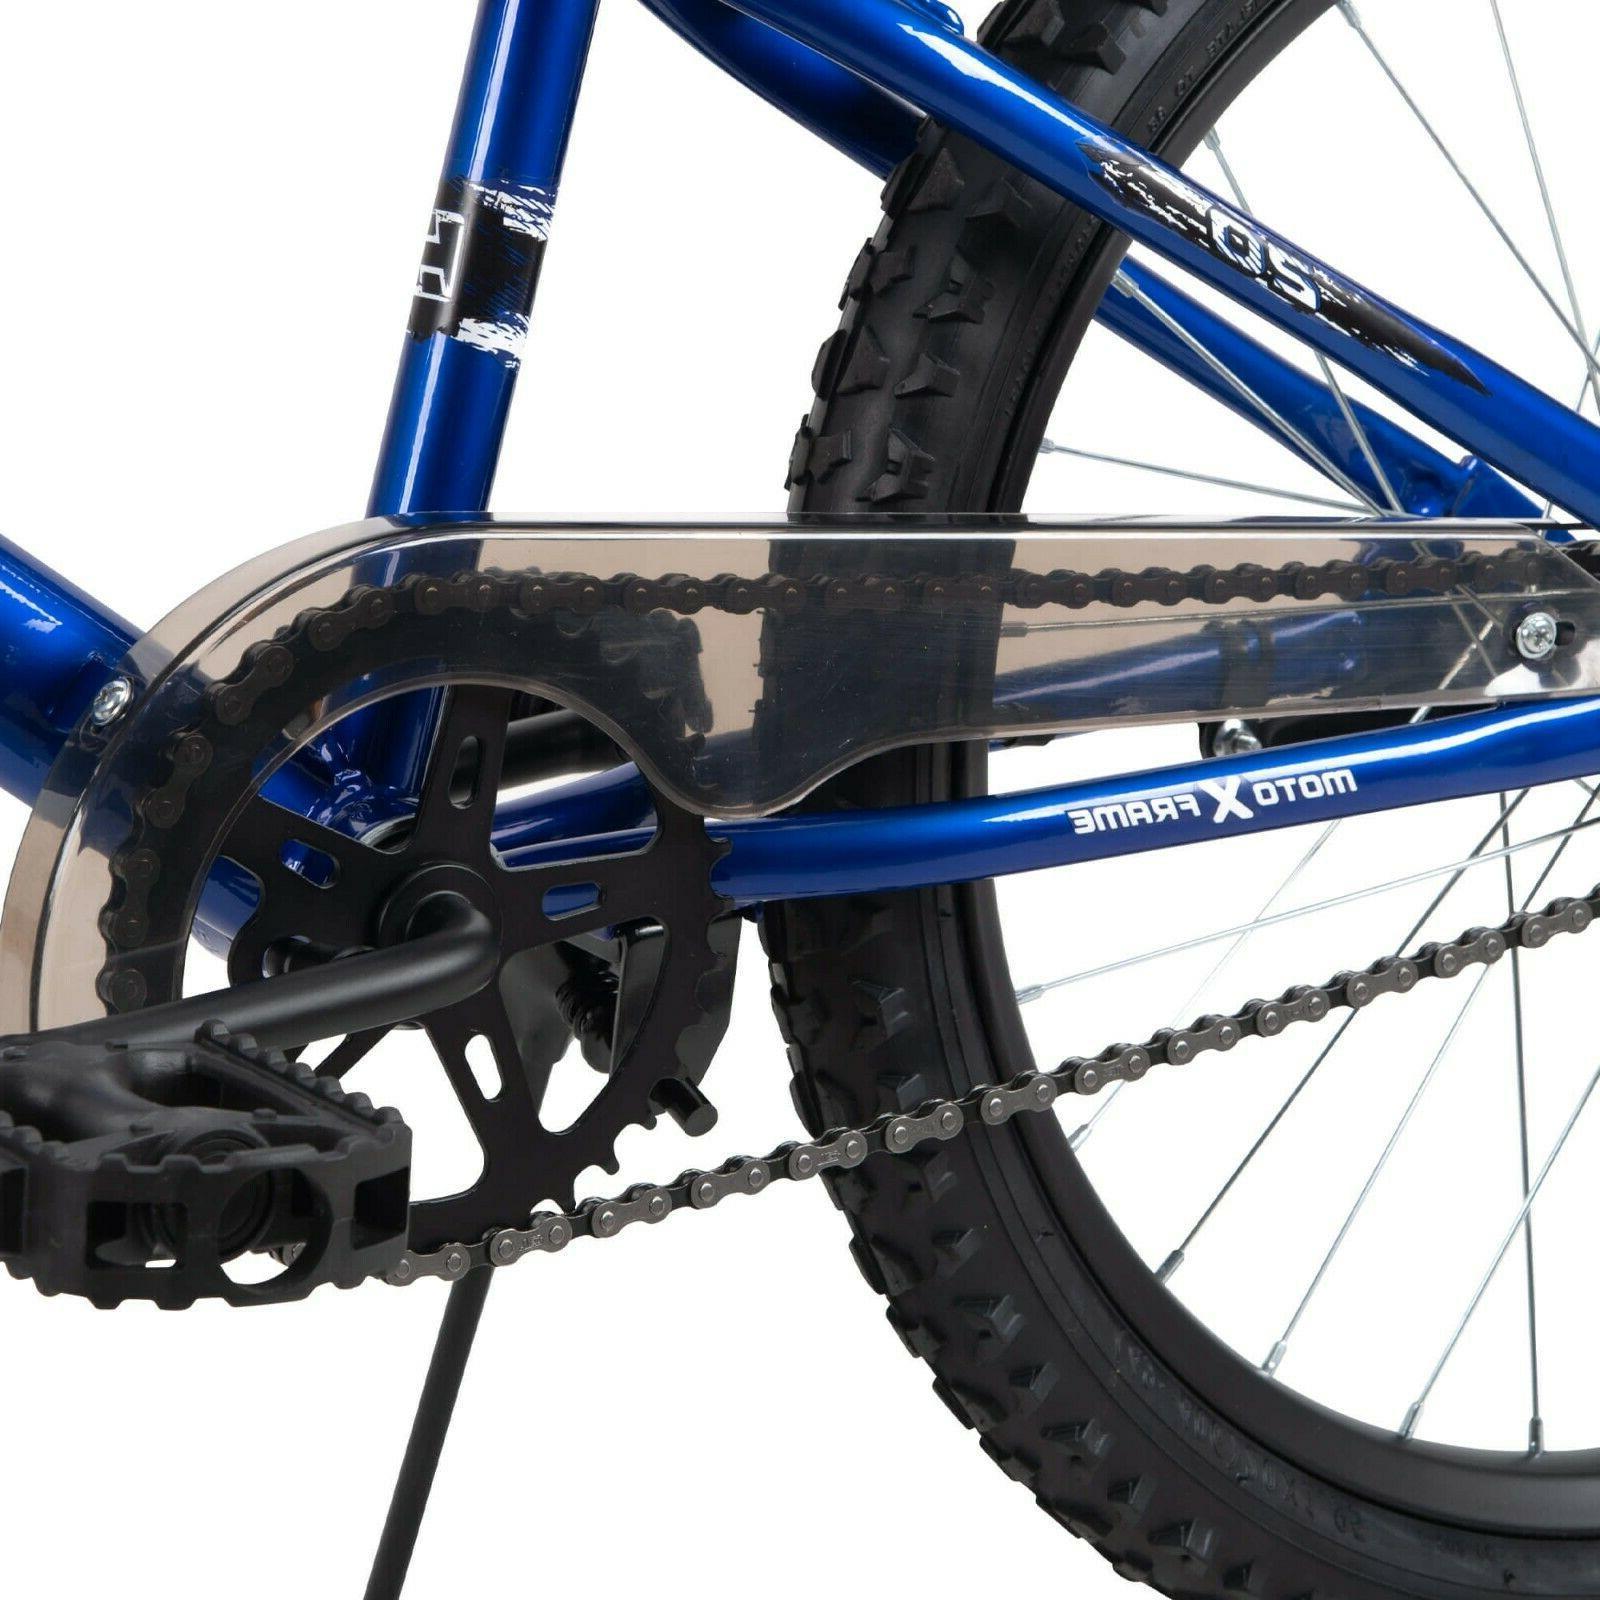 Kids Bike Blue 20 Inch Child Boys Adjustable Seat Brake